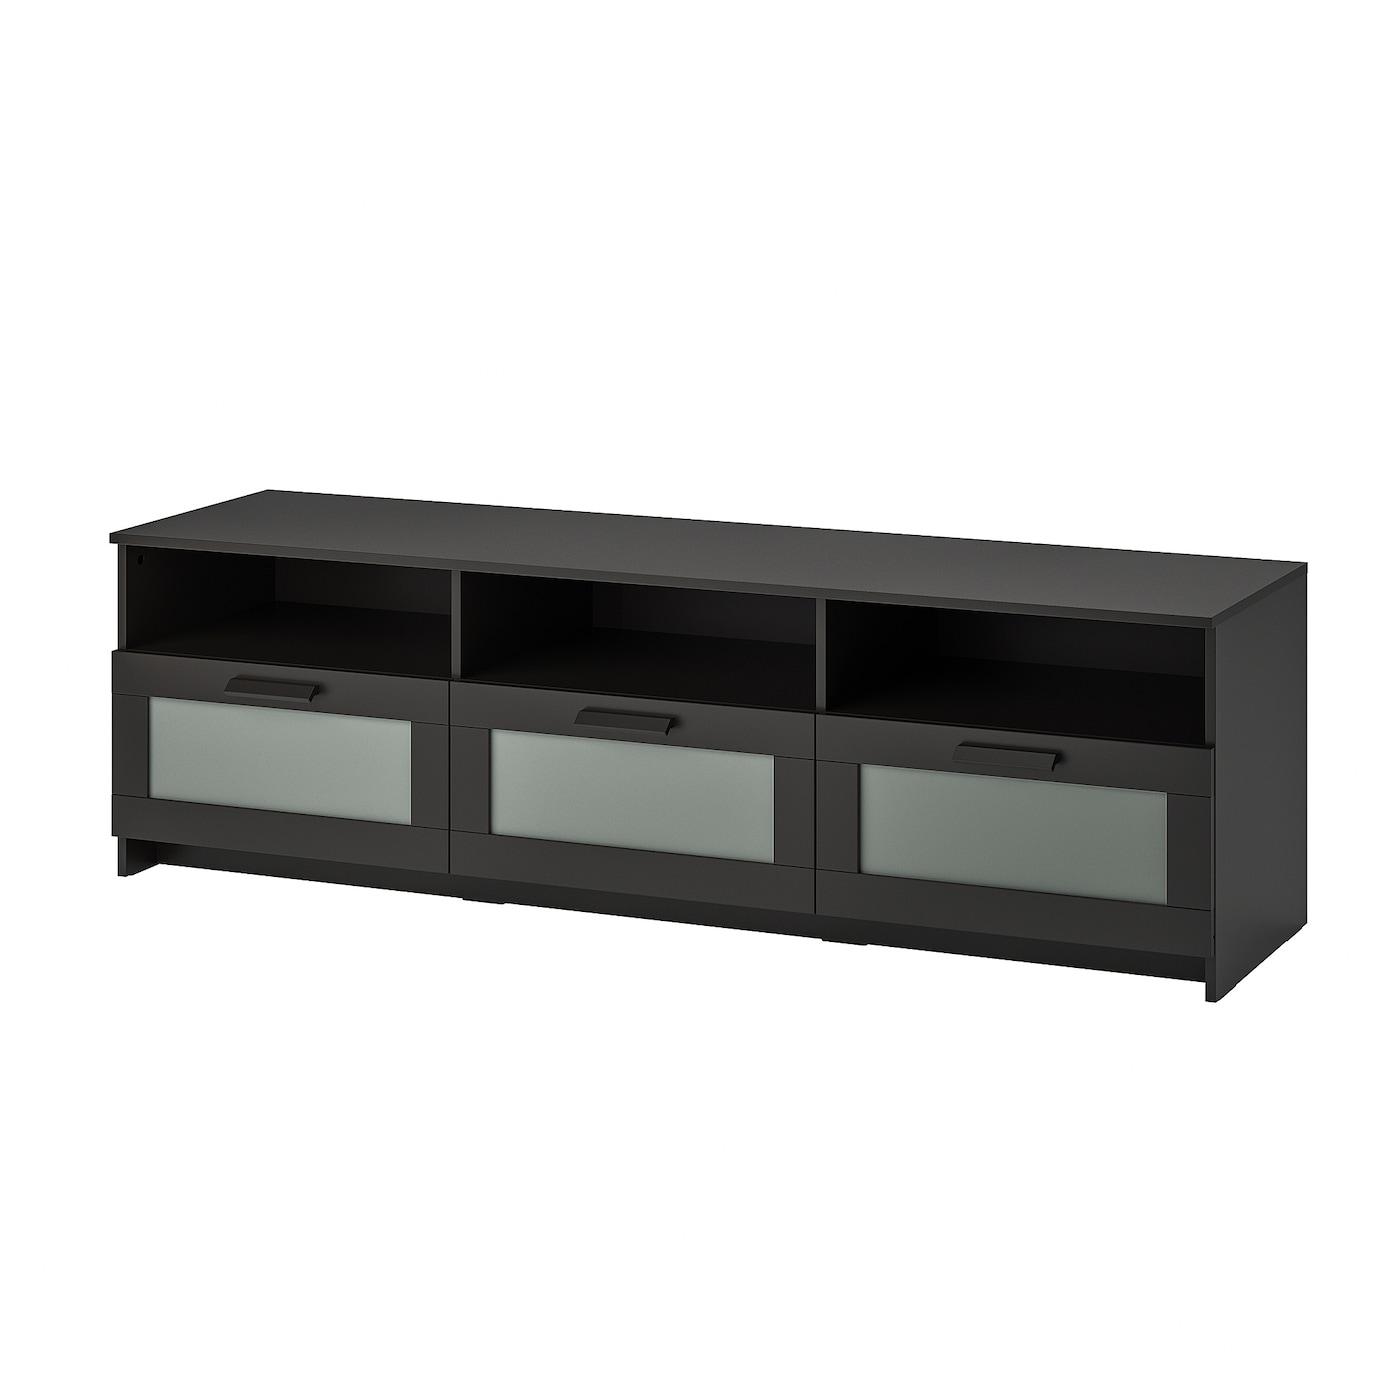 IKEA BRIMNES czarna szafka pod TV, 180x41x53 cm